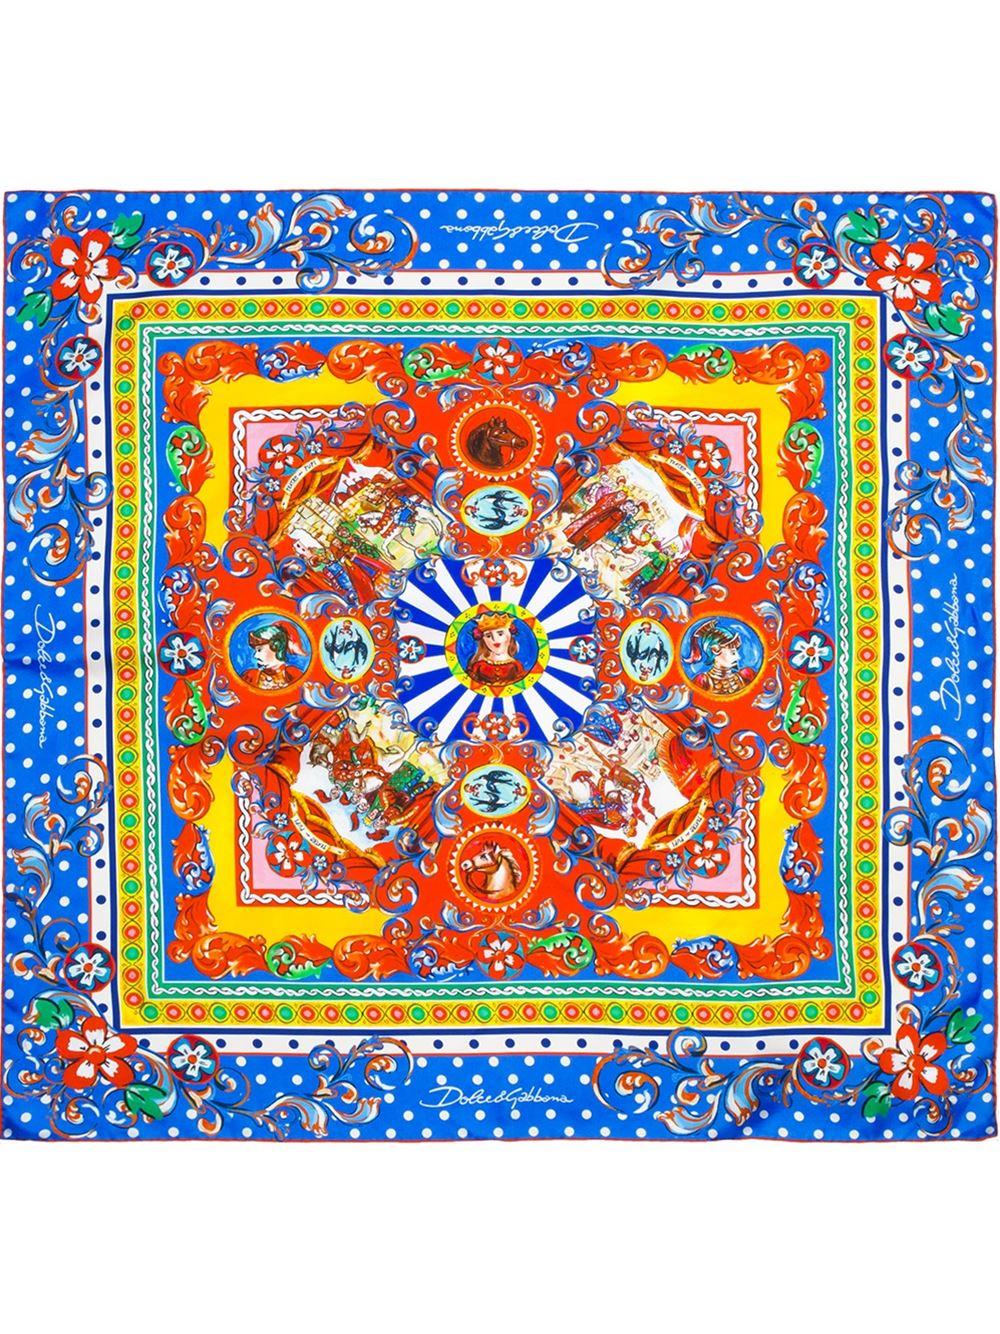 lyst dolce amp gabbana carretto siciliano print foulard in